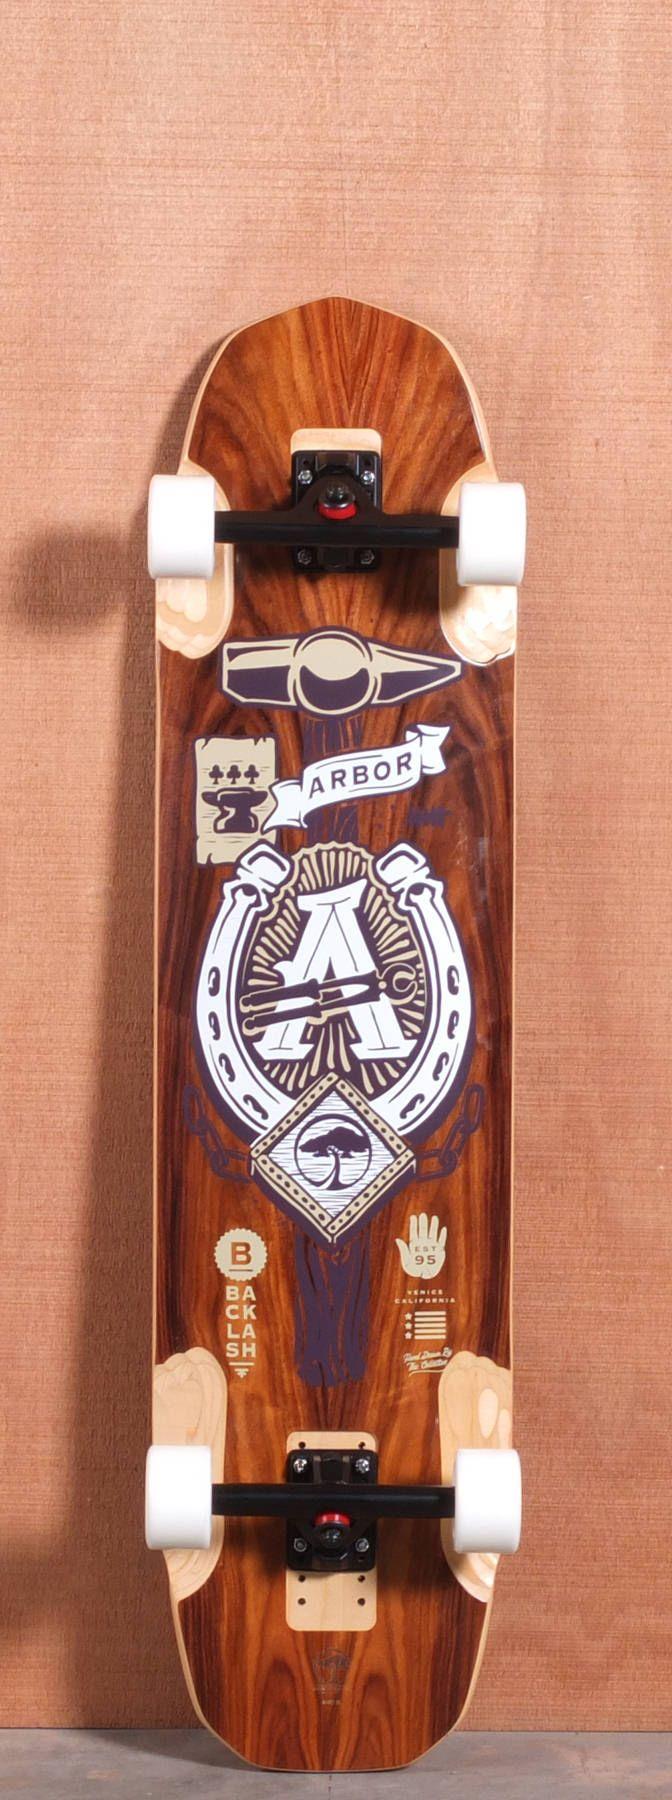 "Arbor 40.5"" Backlash Longboard Complete"